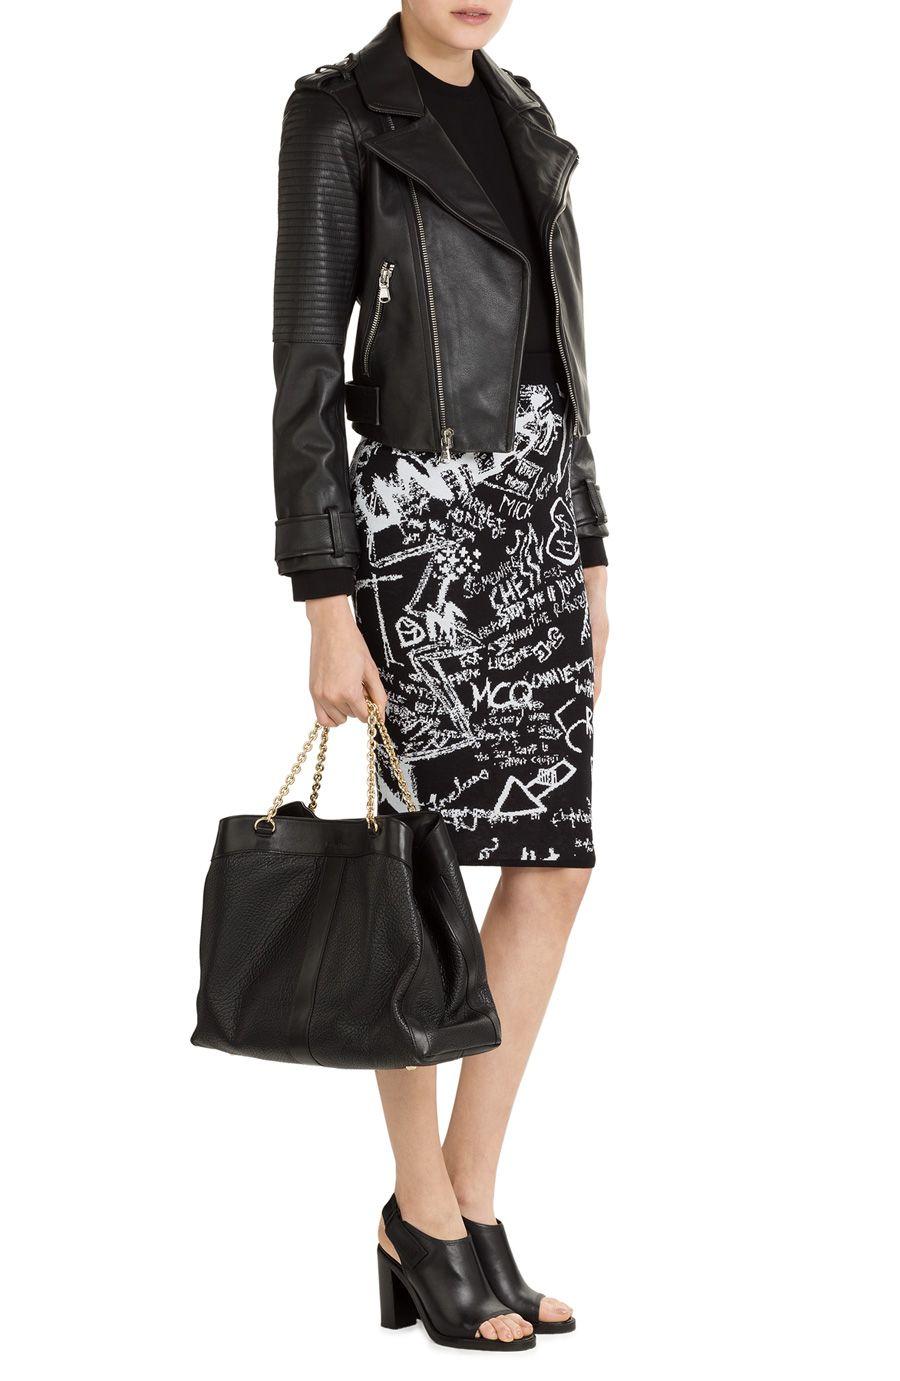 Stretch Intarsia graffiti Skirt